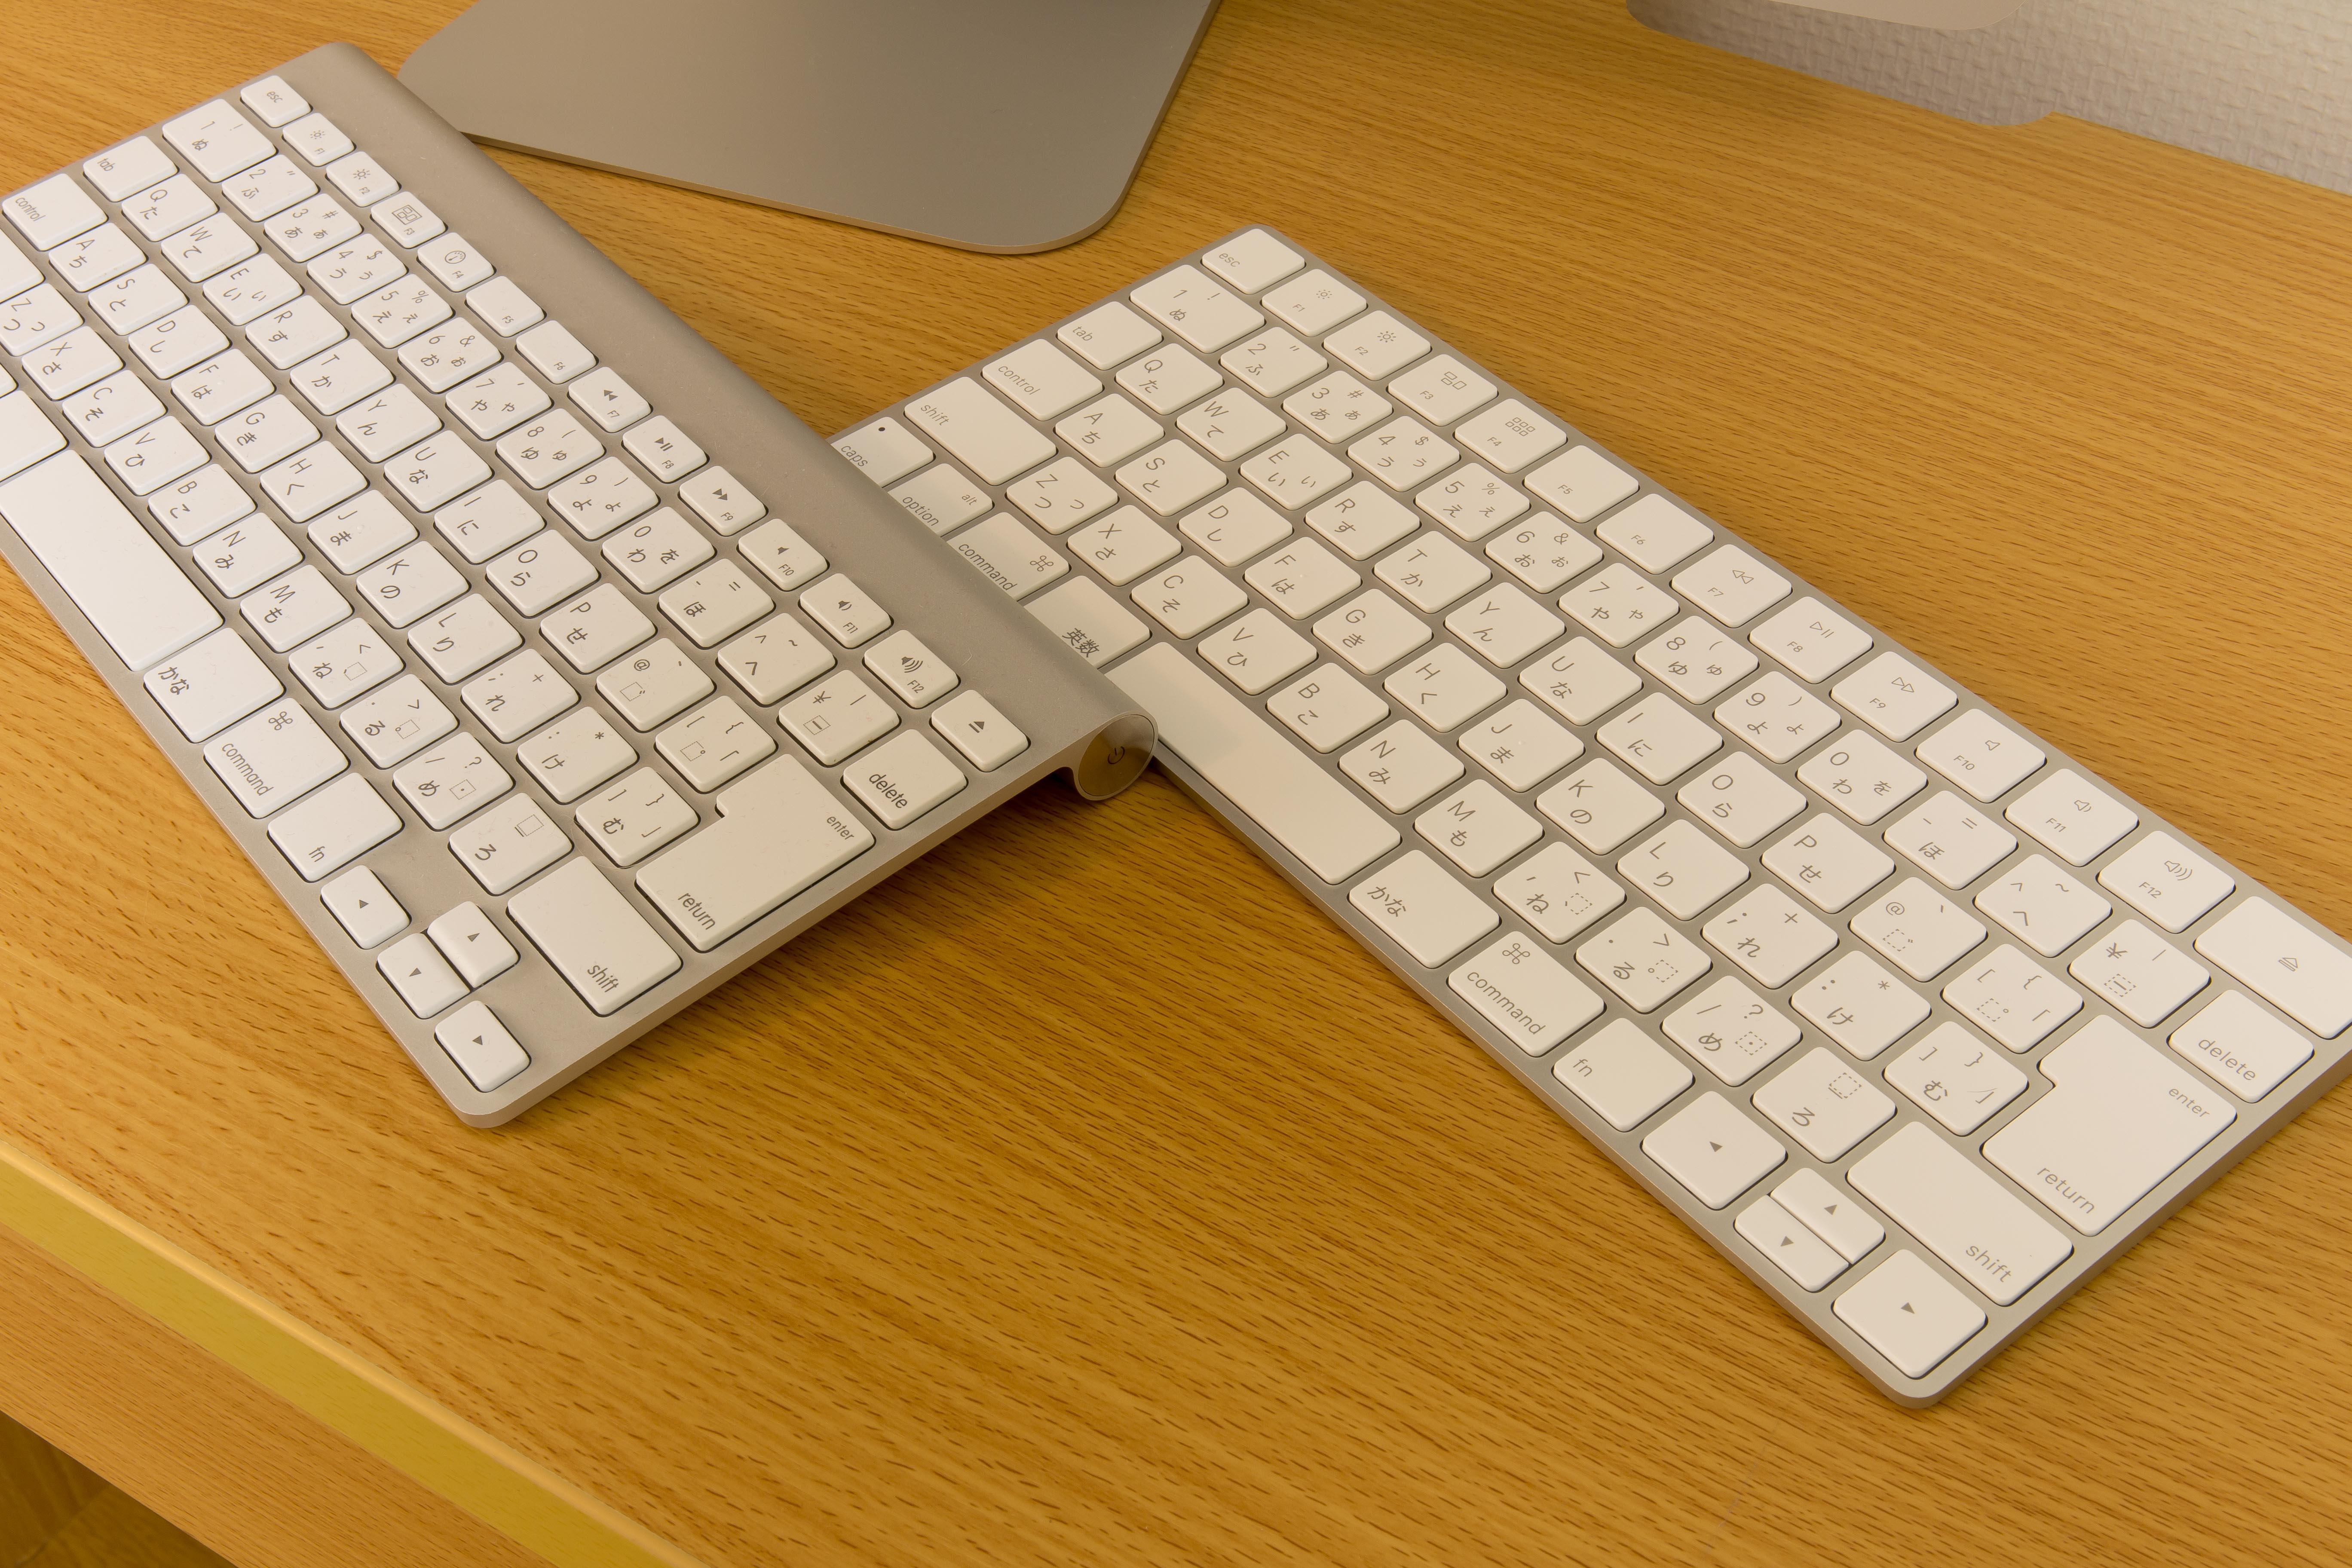 「iMac Retina 21.5インチ」購入(7)